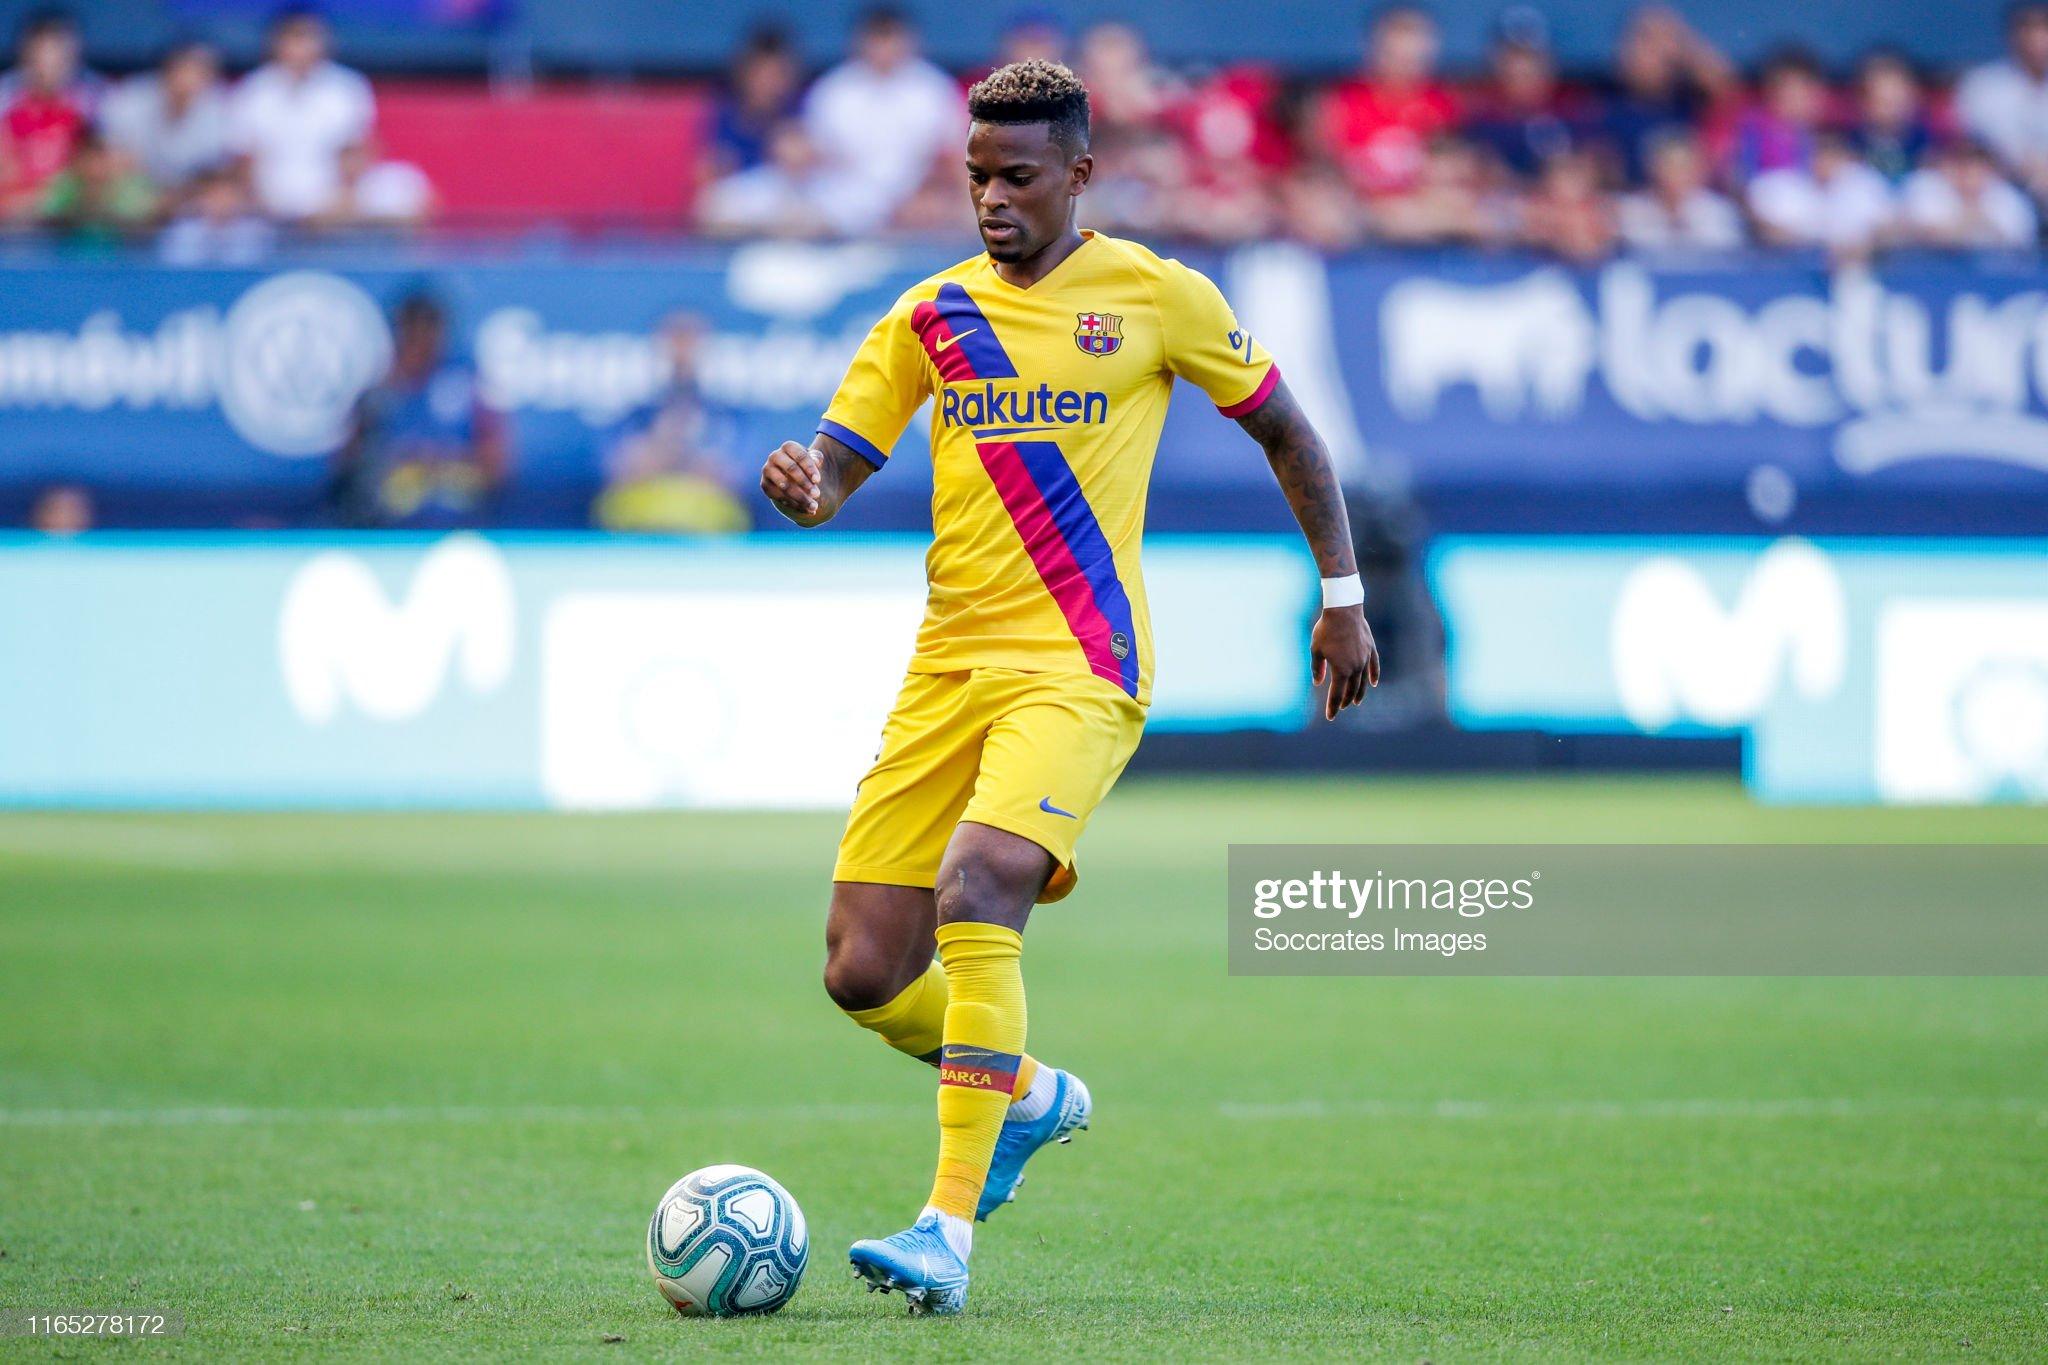 صور مباراة : أوساسونا - برشلونة 2-2 ( 31-08-2019 )  Nelson-semedo-of-fc-barcelona-during-the-la-liga-santander-match-v-picture-id1165278172?s=2048x2048